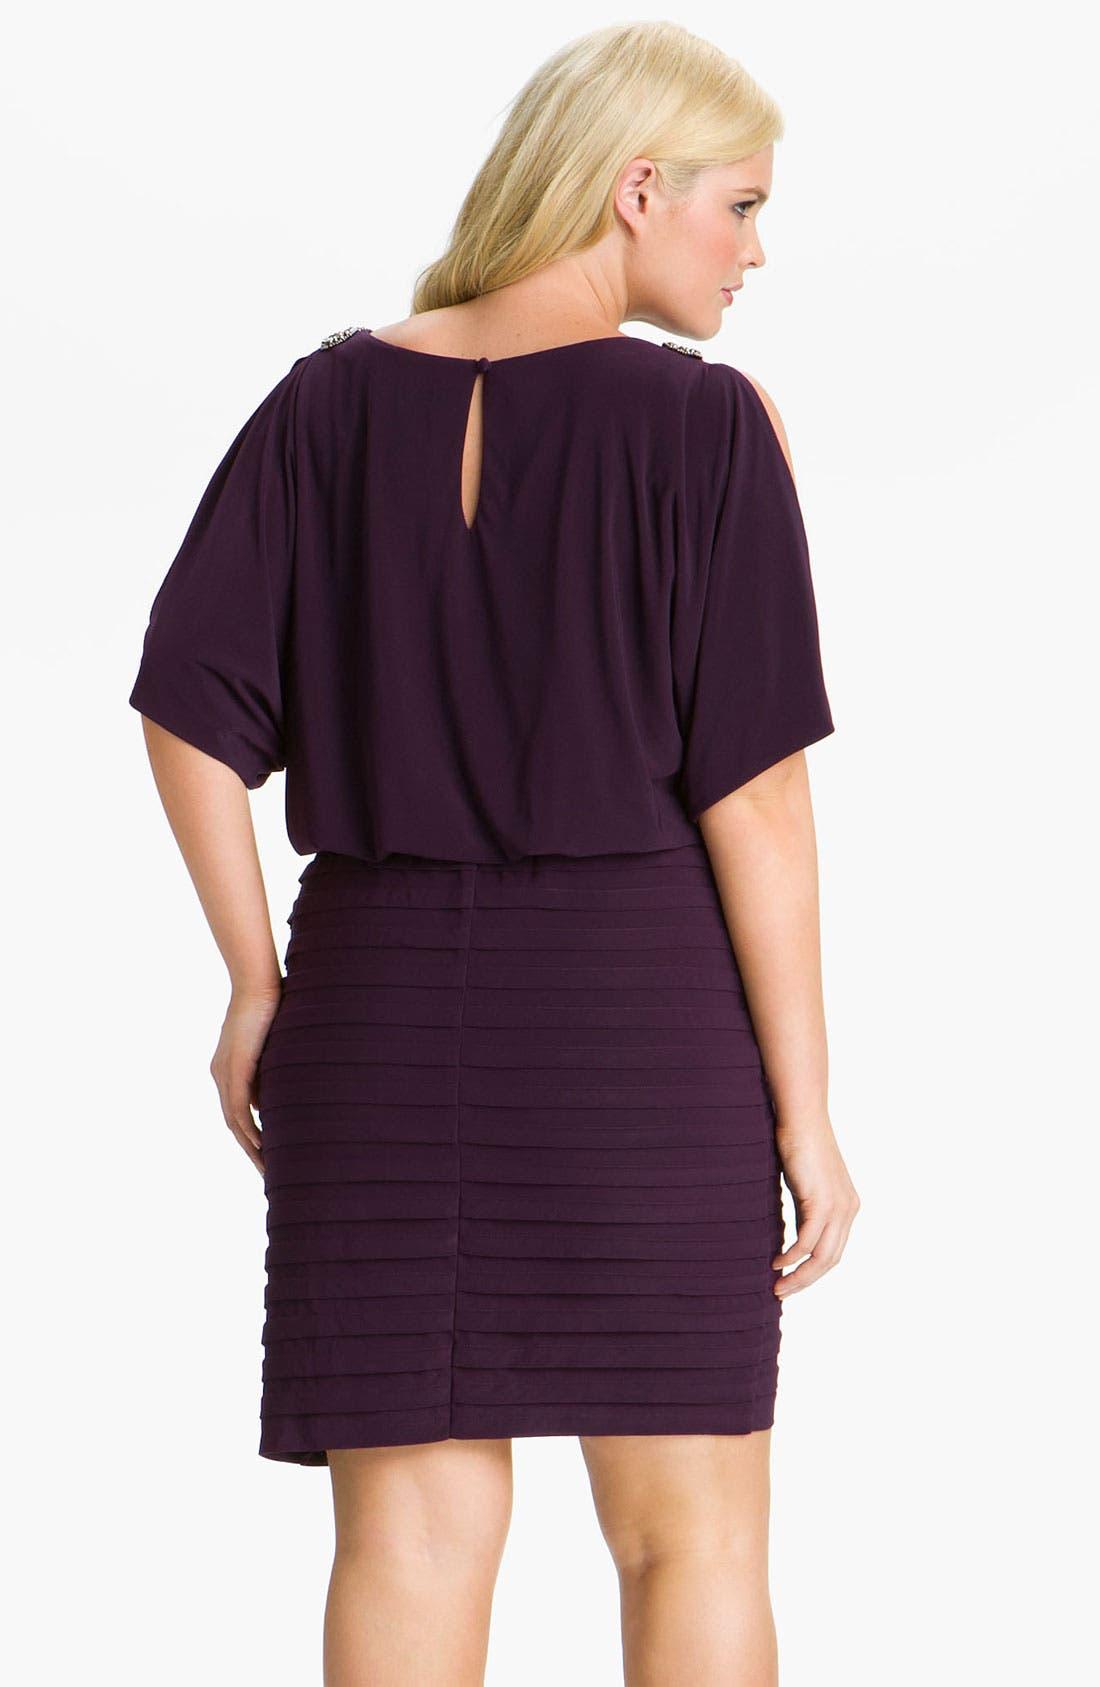 Alternate Image 2  - Xscape Embellished Matte Jersey Blouson Dress (Plus)